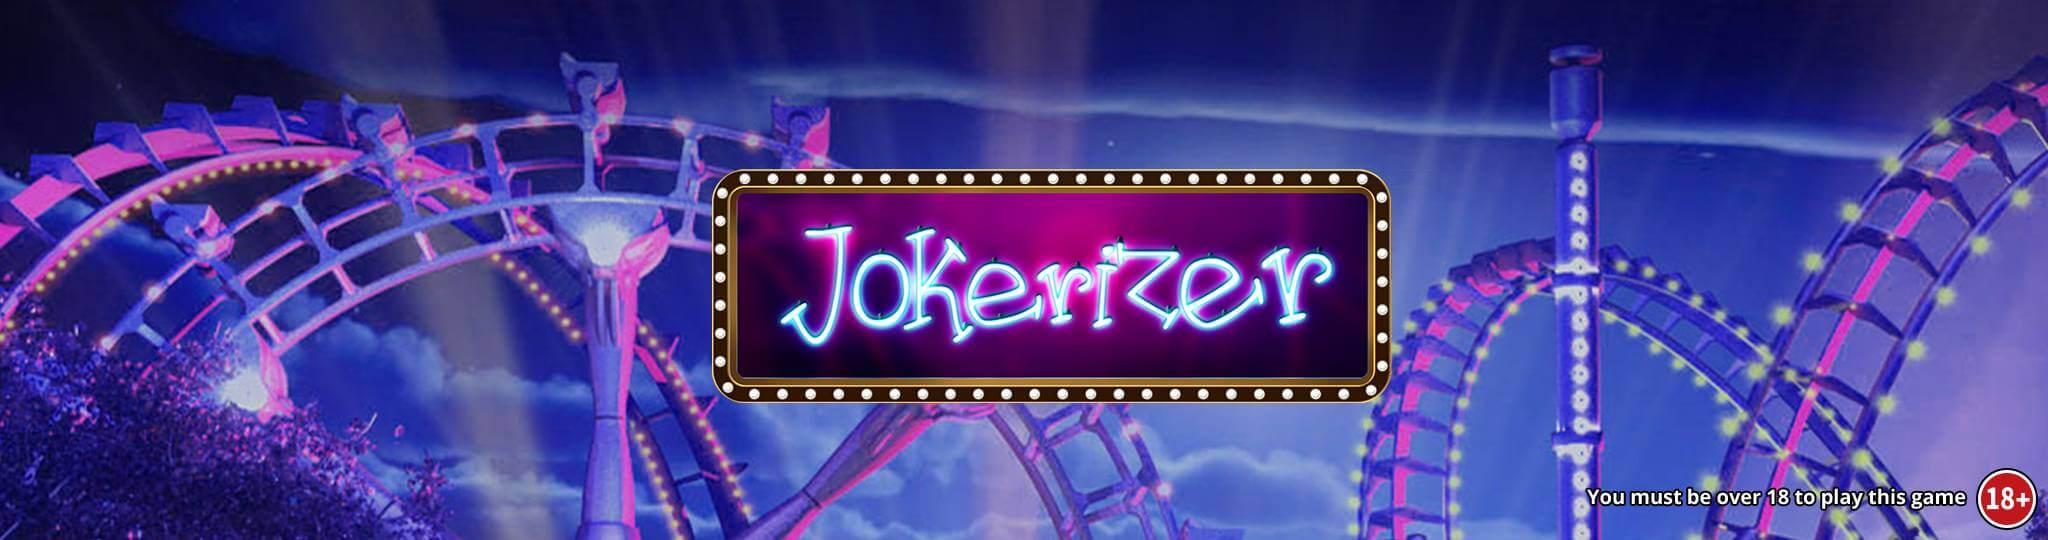 jokerizer topp 10 spilleautomater online